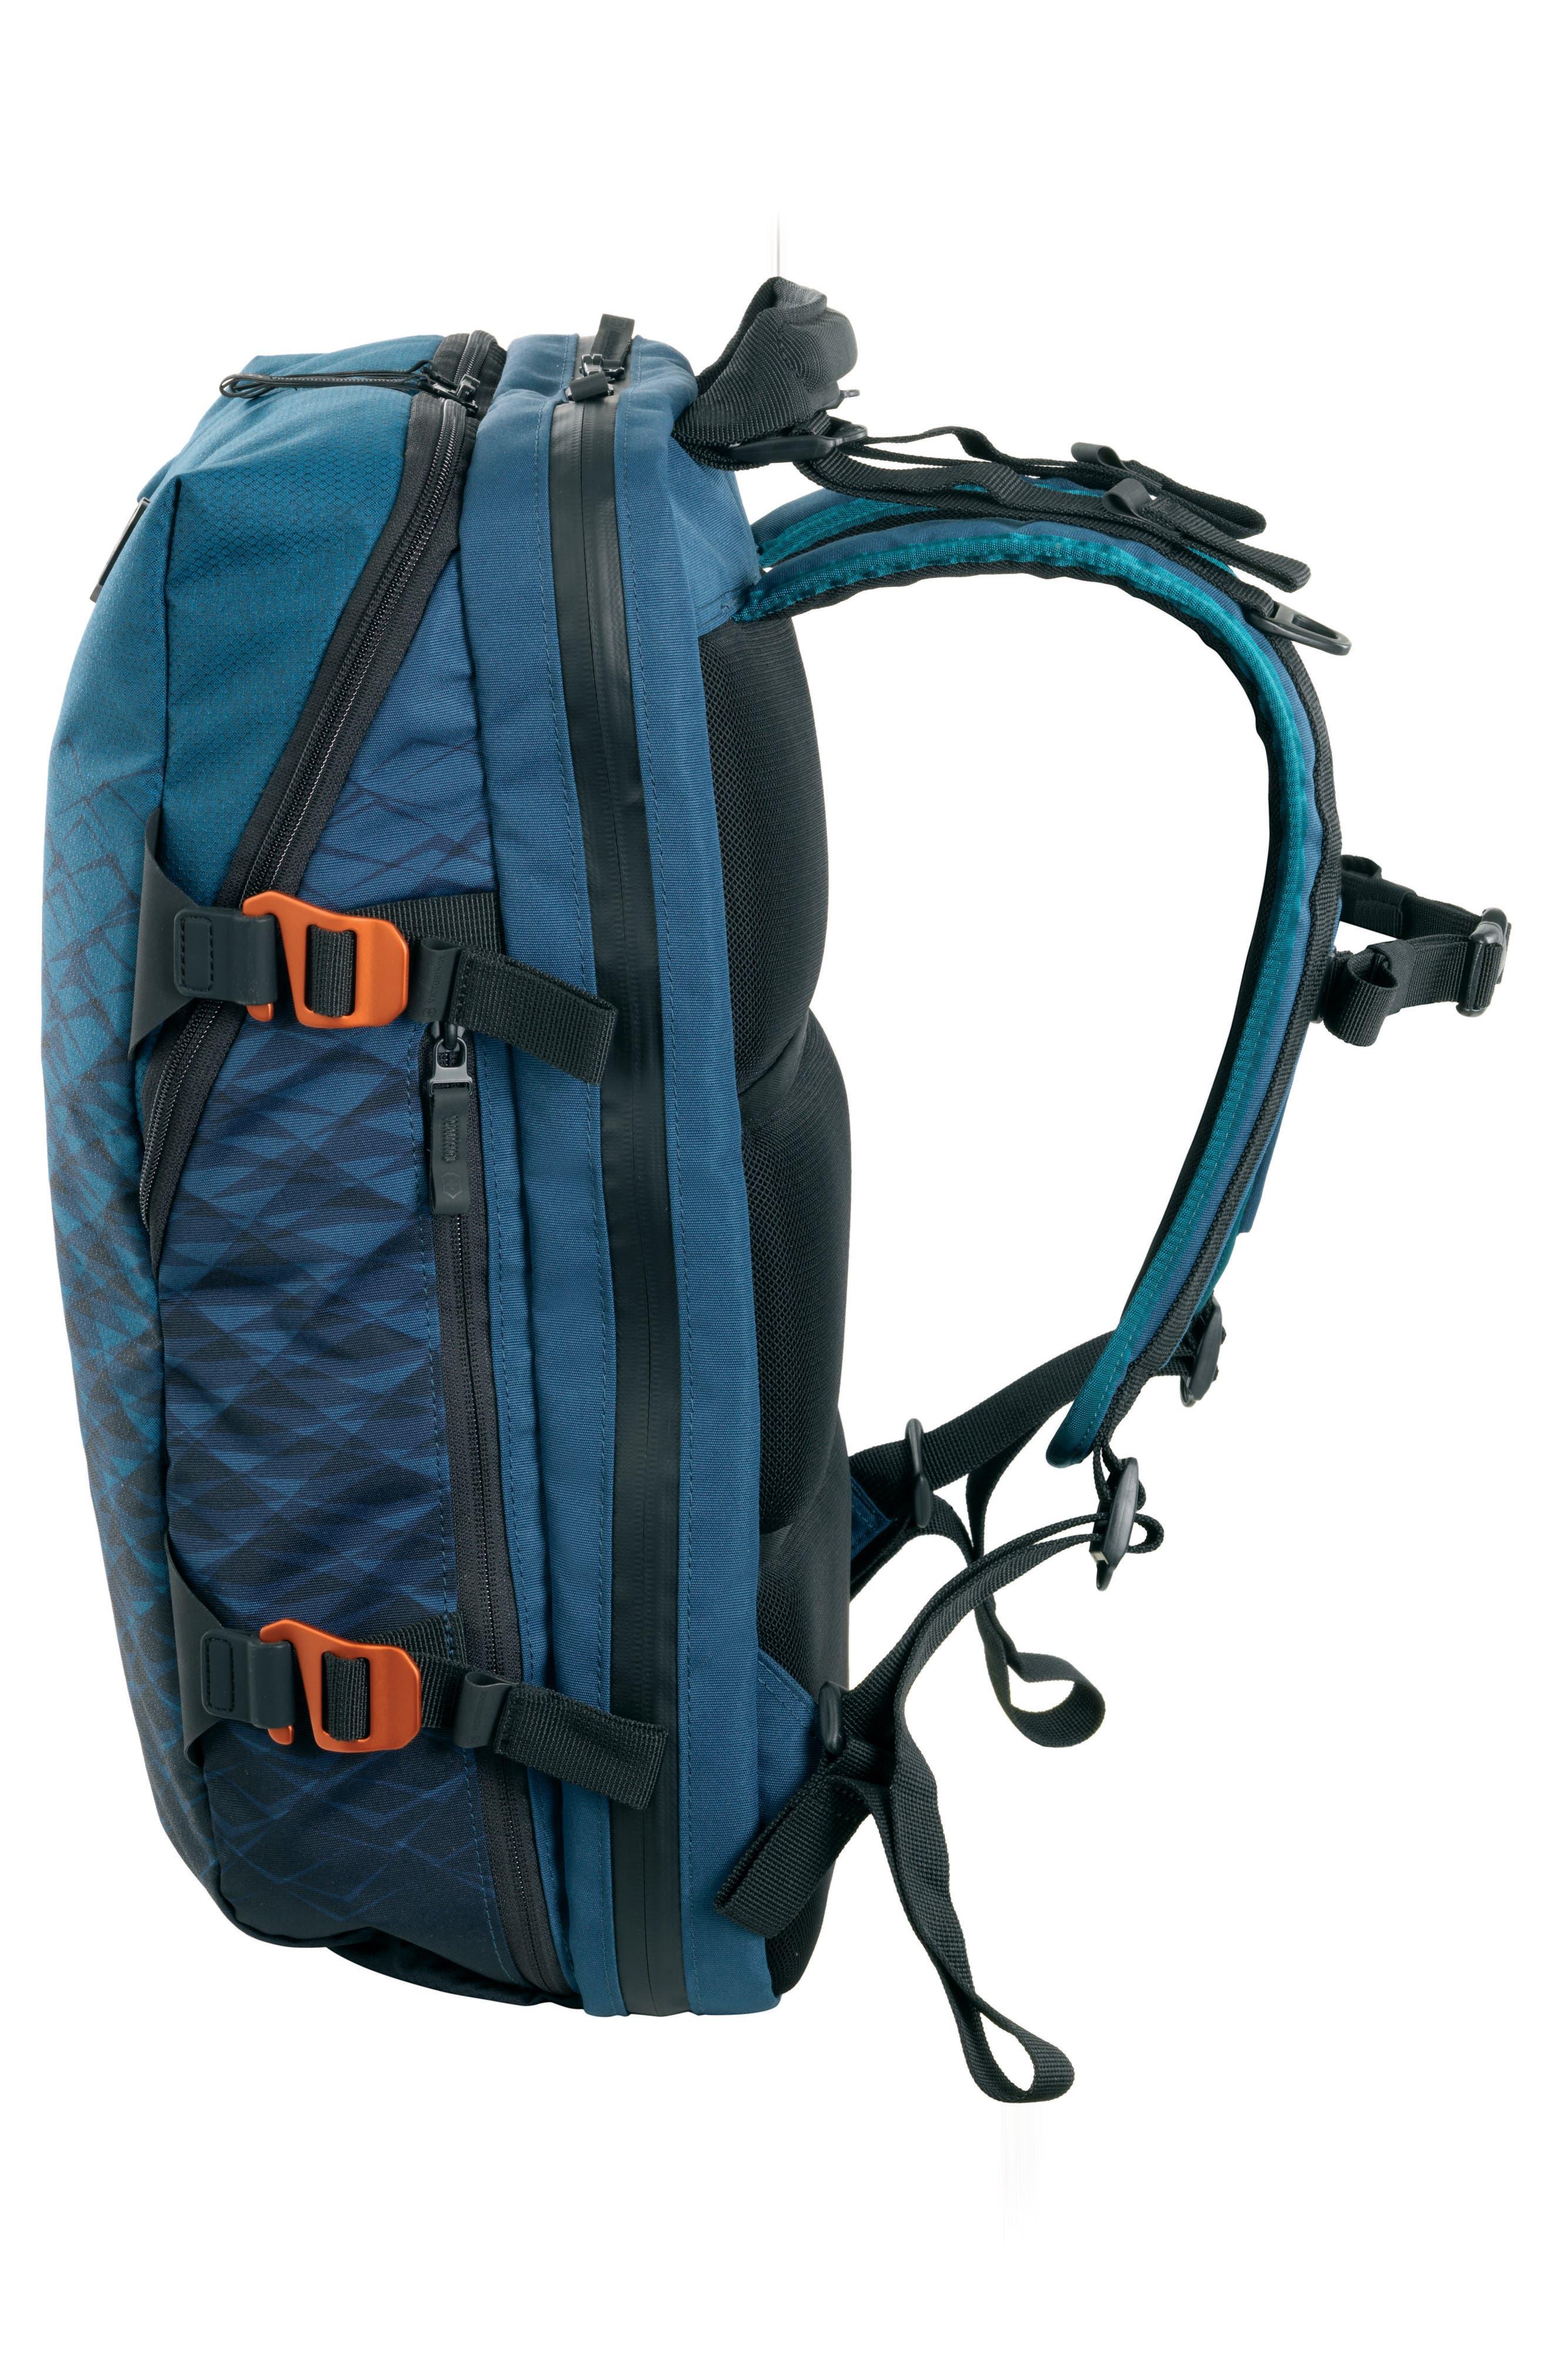 VX Touring Laptop Backpack,                             Alternate thumbnail 3, color,                             DARK TEAL